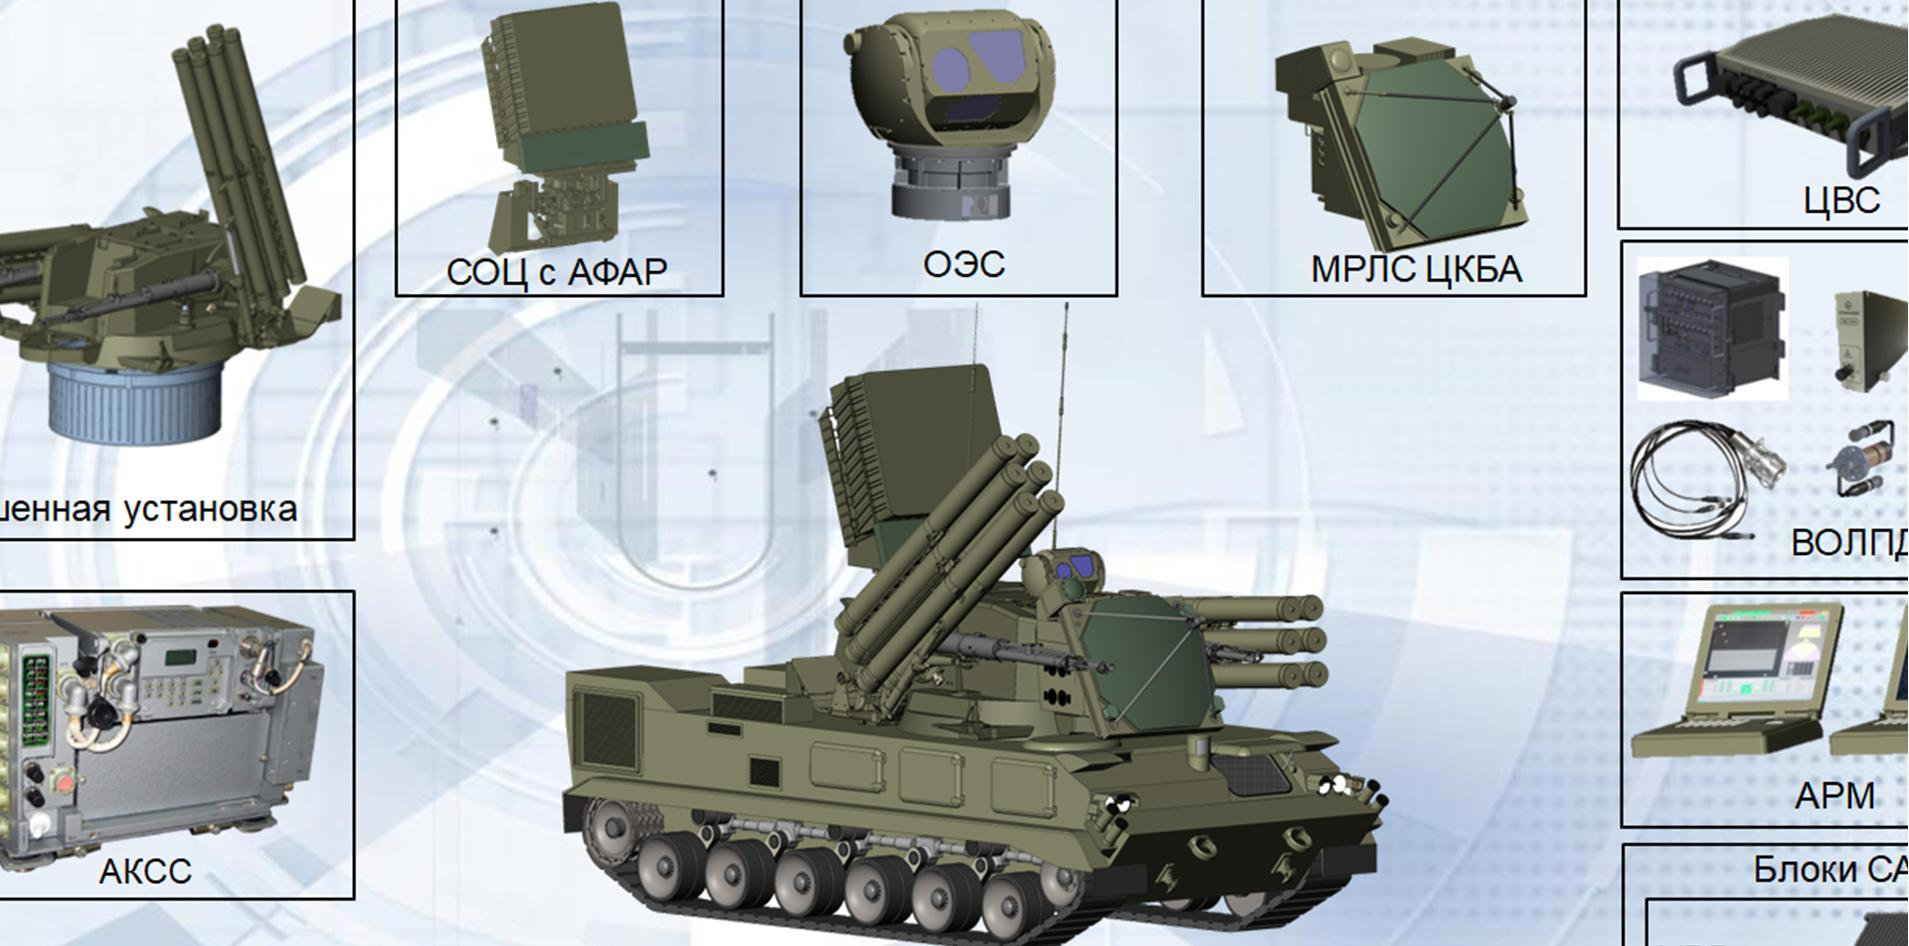 Tunguska gun/missile system replacement - Page 6 EcQDUMqWAAMlGl1?format=jpg&name=large